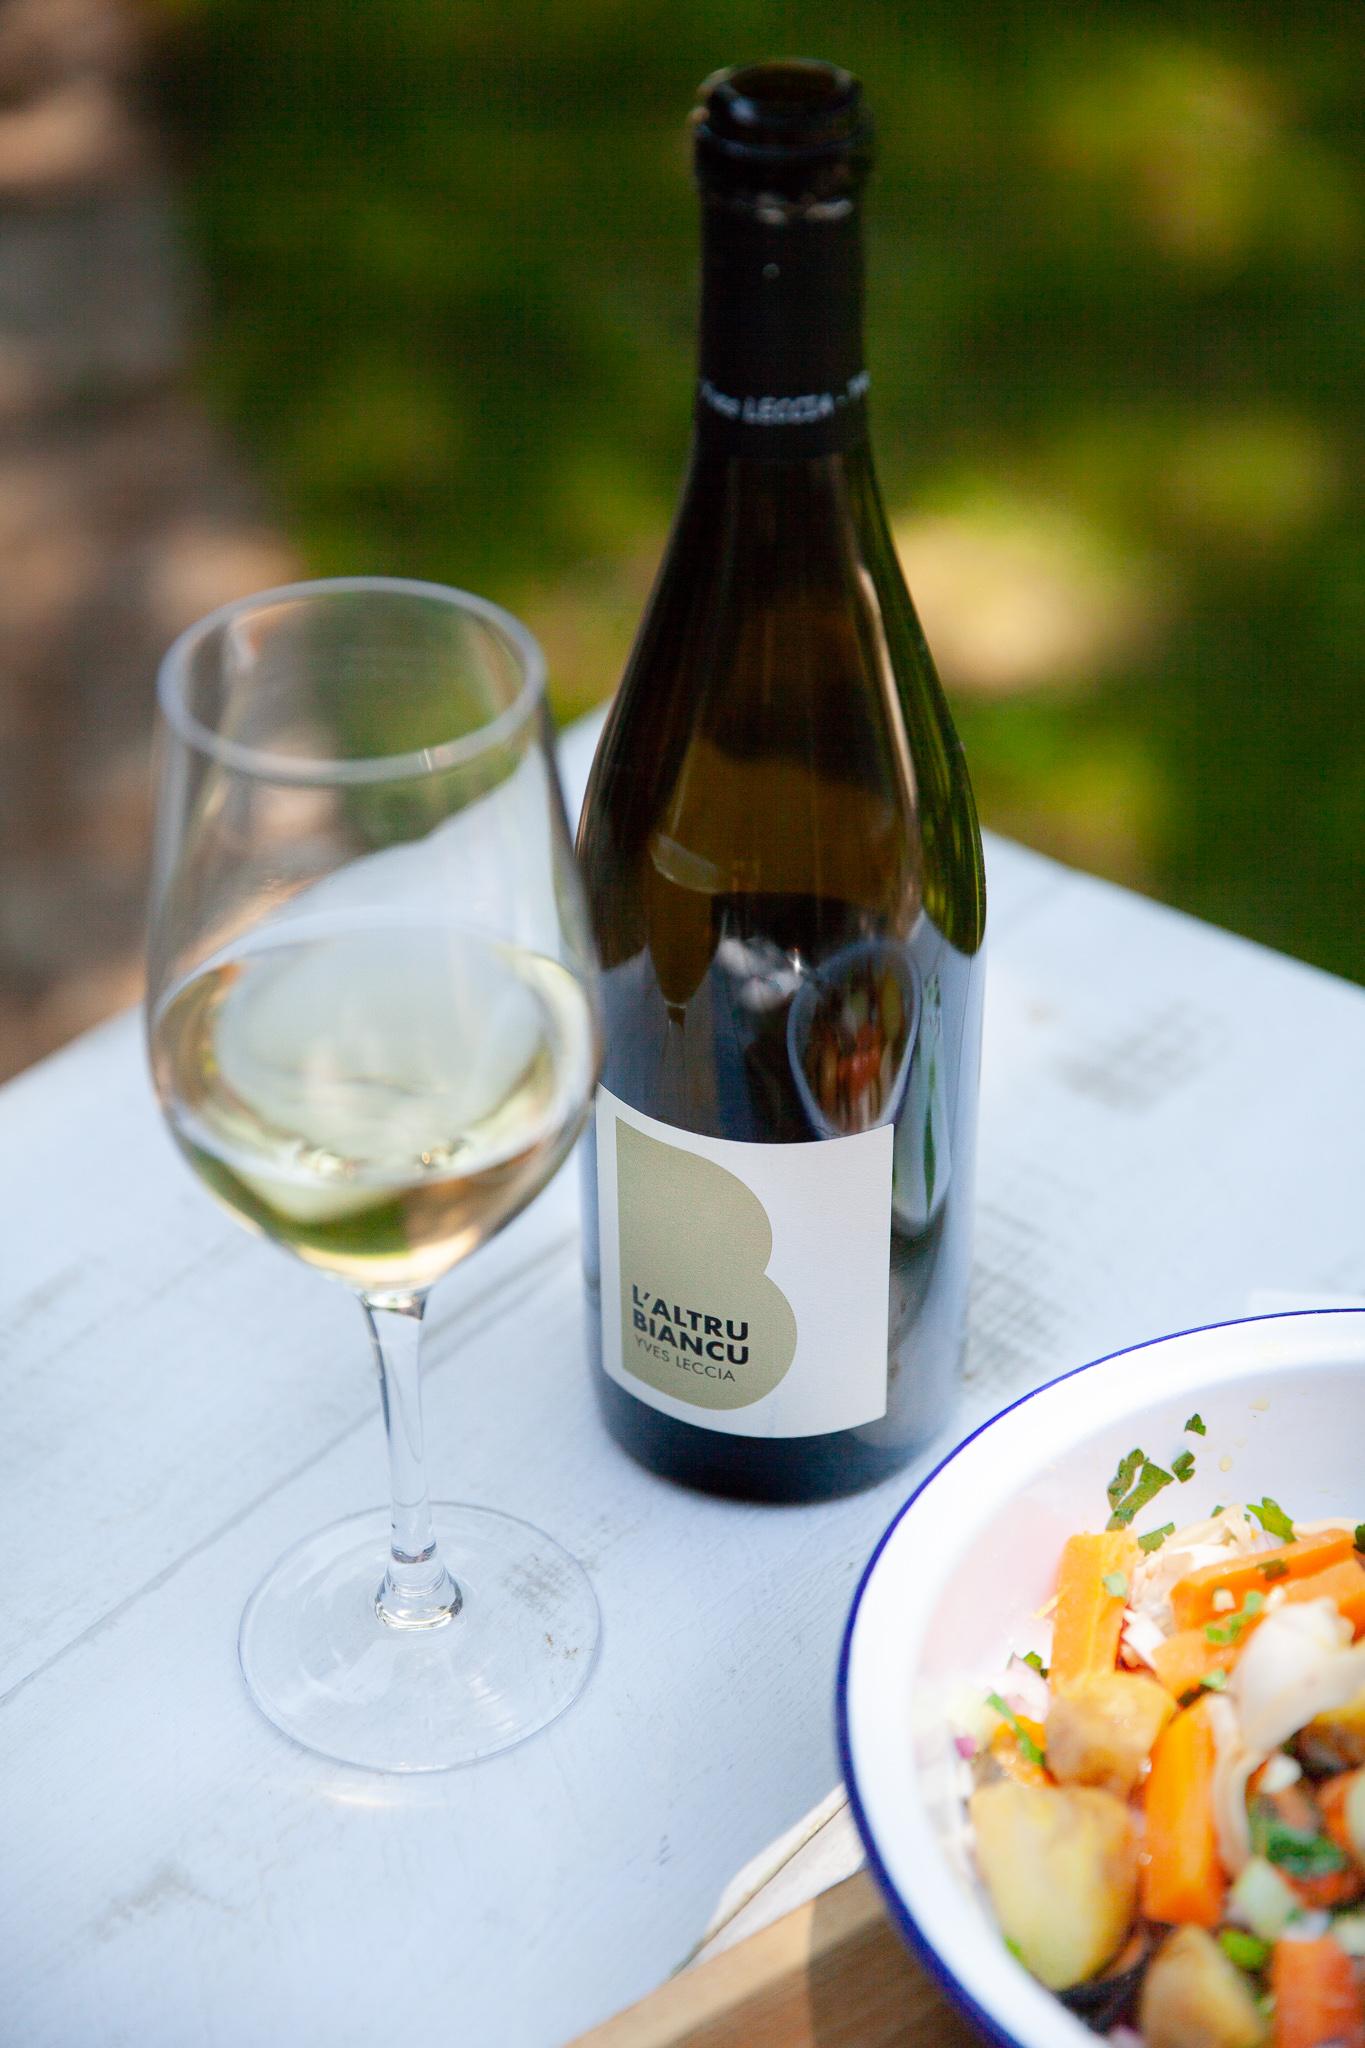 vin blanc corse Patrimonio 'Altru Biancu de Yves Leccia